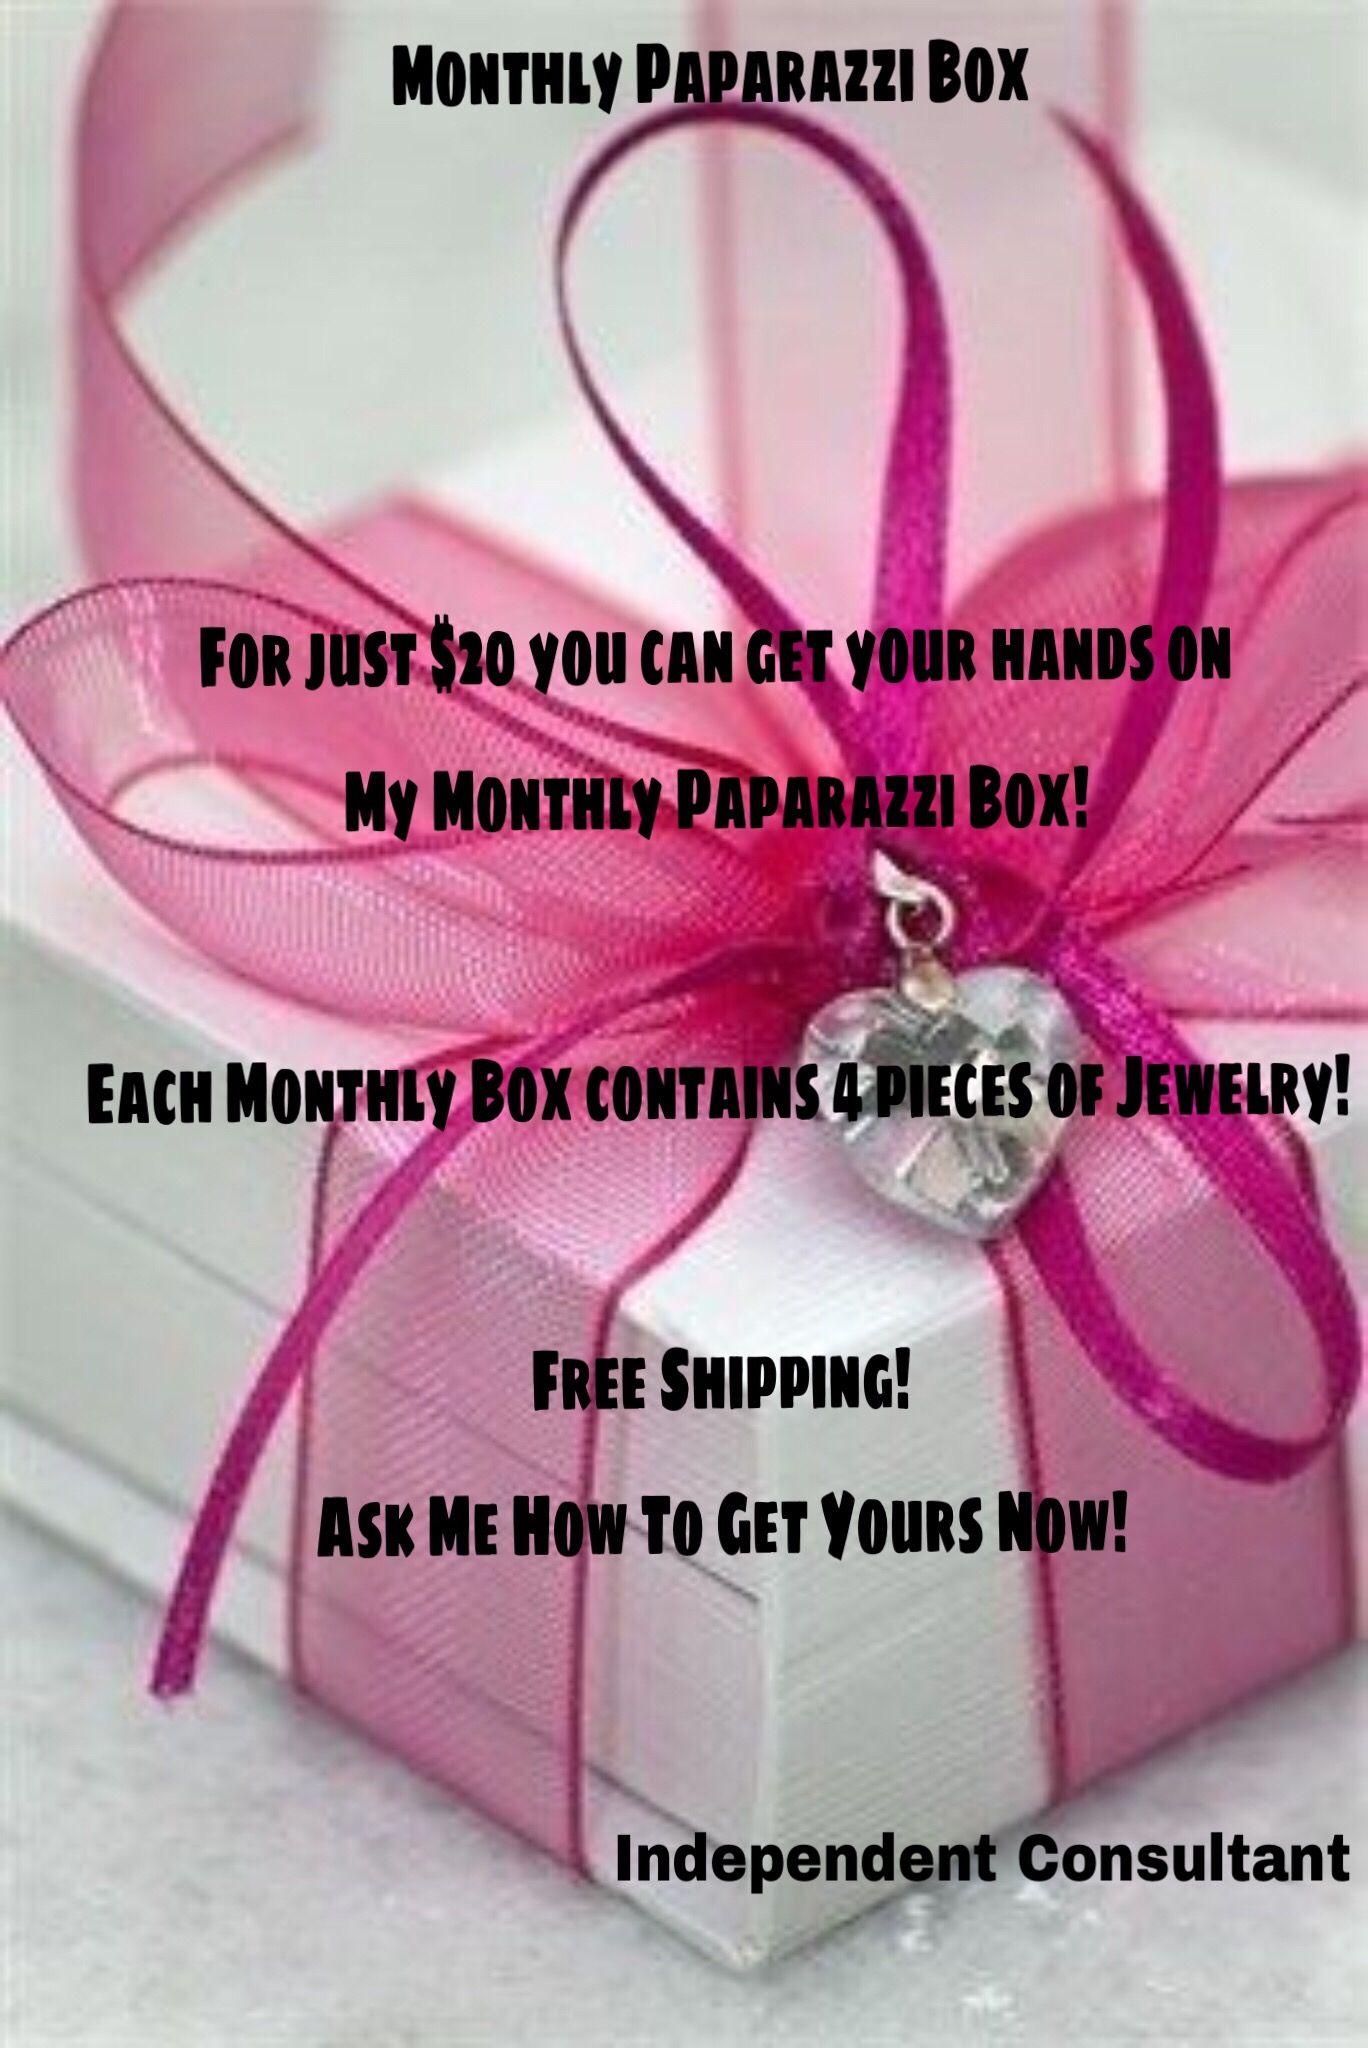 Monthly Paparazzi Box 20 Free Shipping Paparazzi